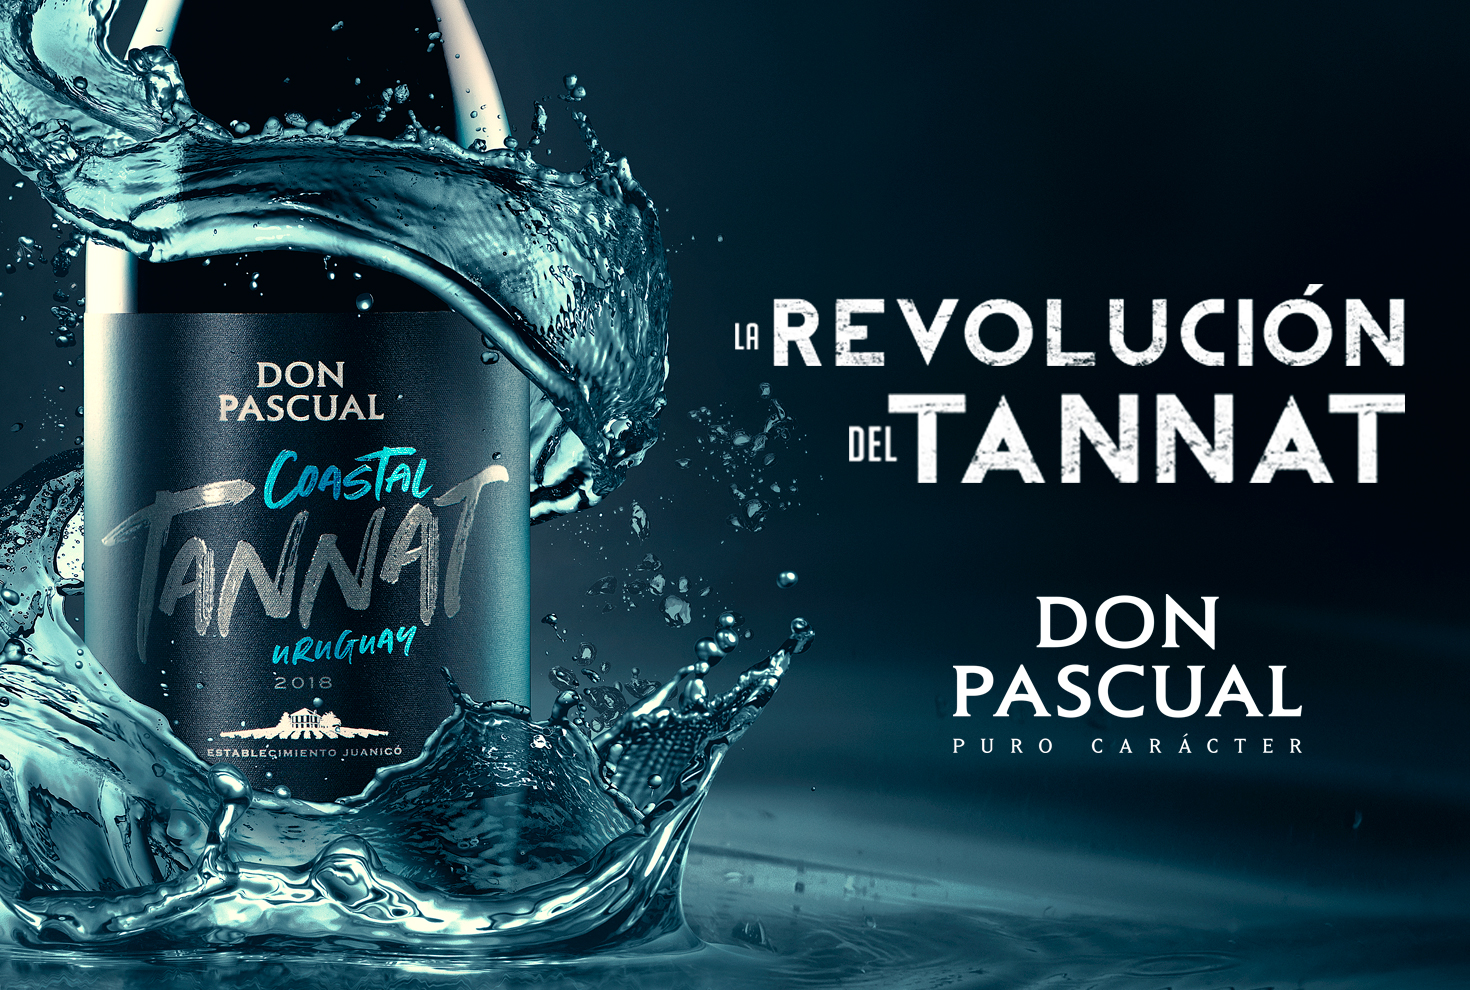 Don Pascual Coastal Tannat